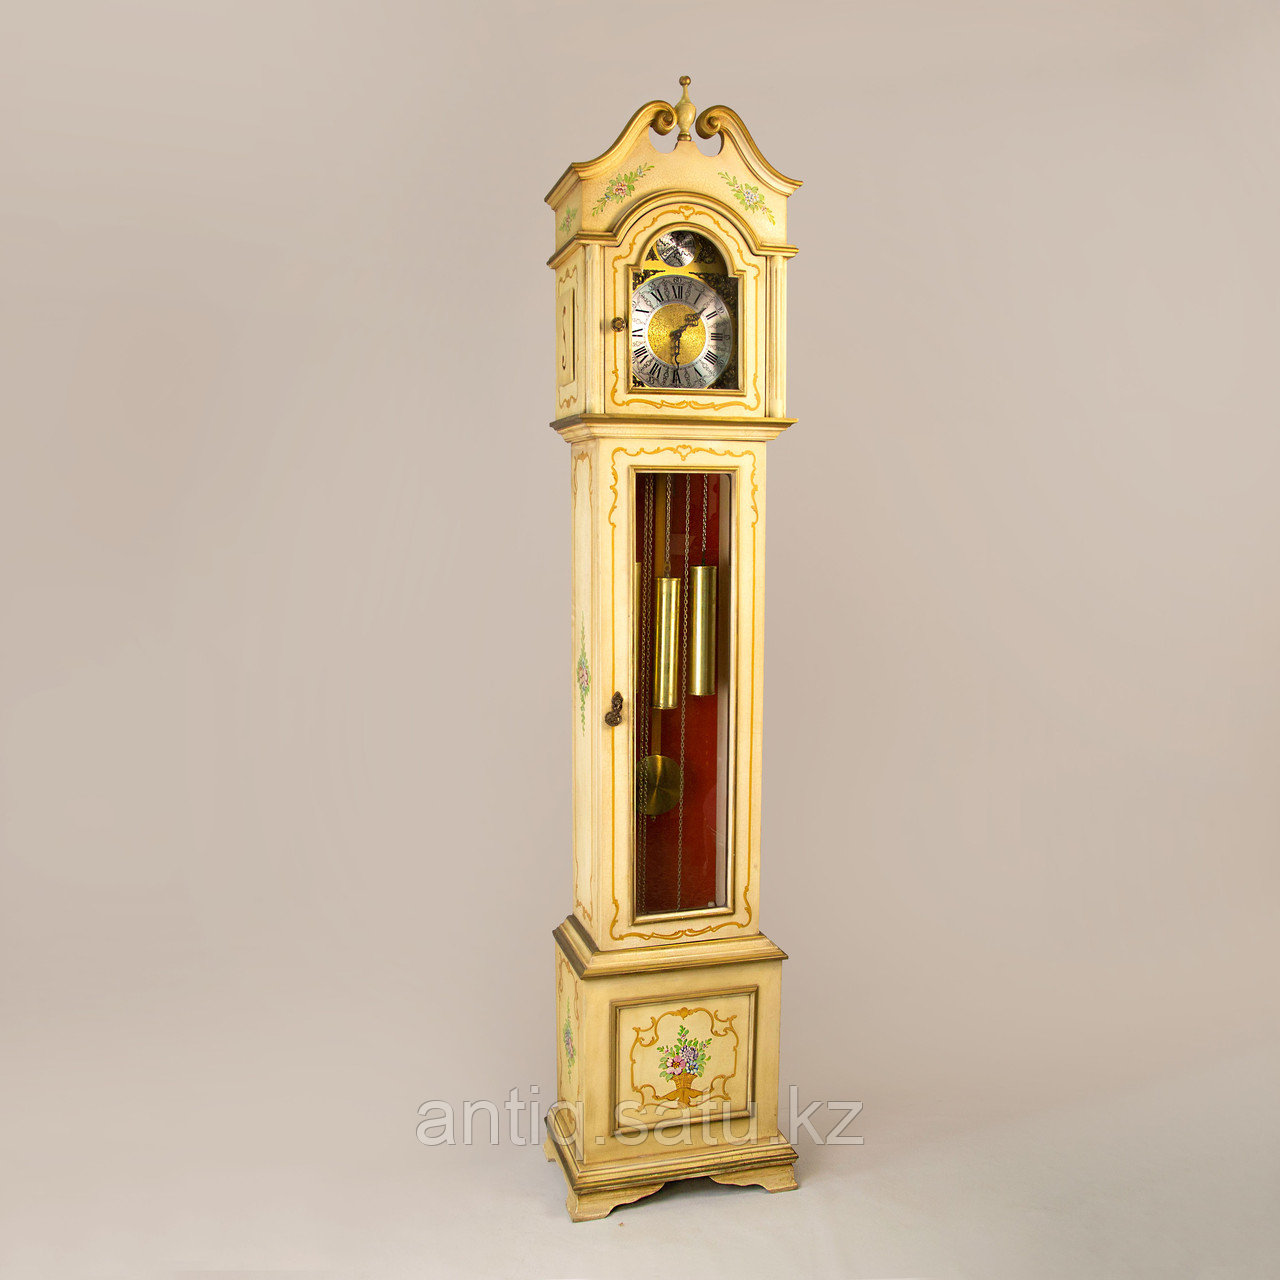 Напольные часы. Часовая мастерская Franz Hermle & Sohne. Германия. 1977 год. - фото 2